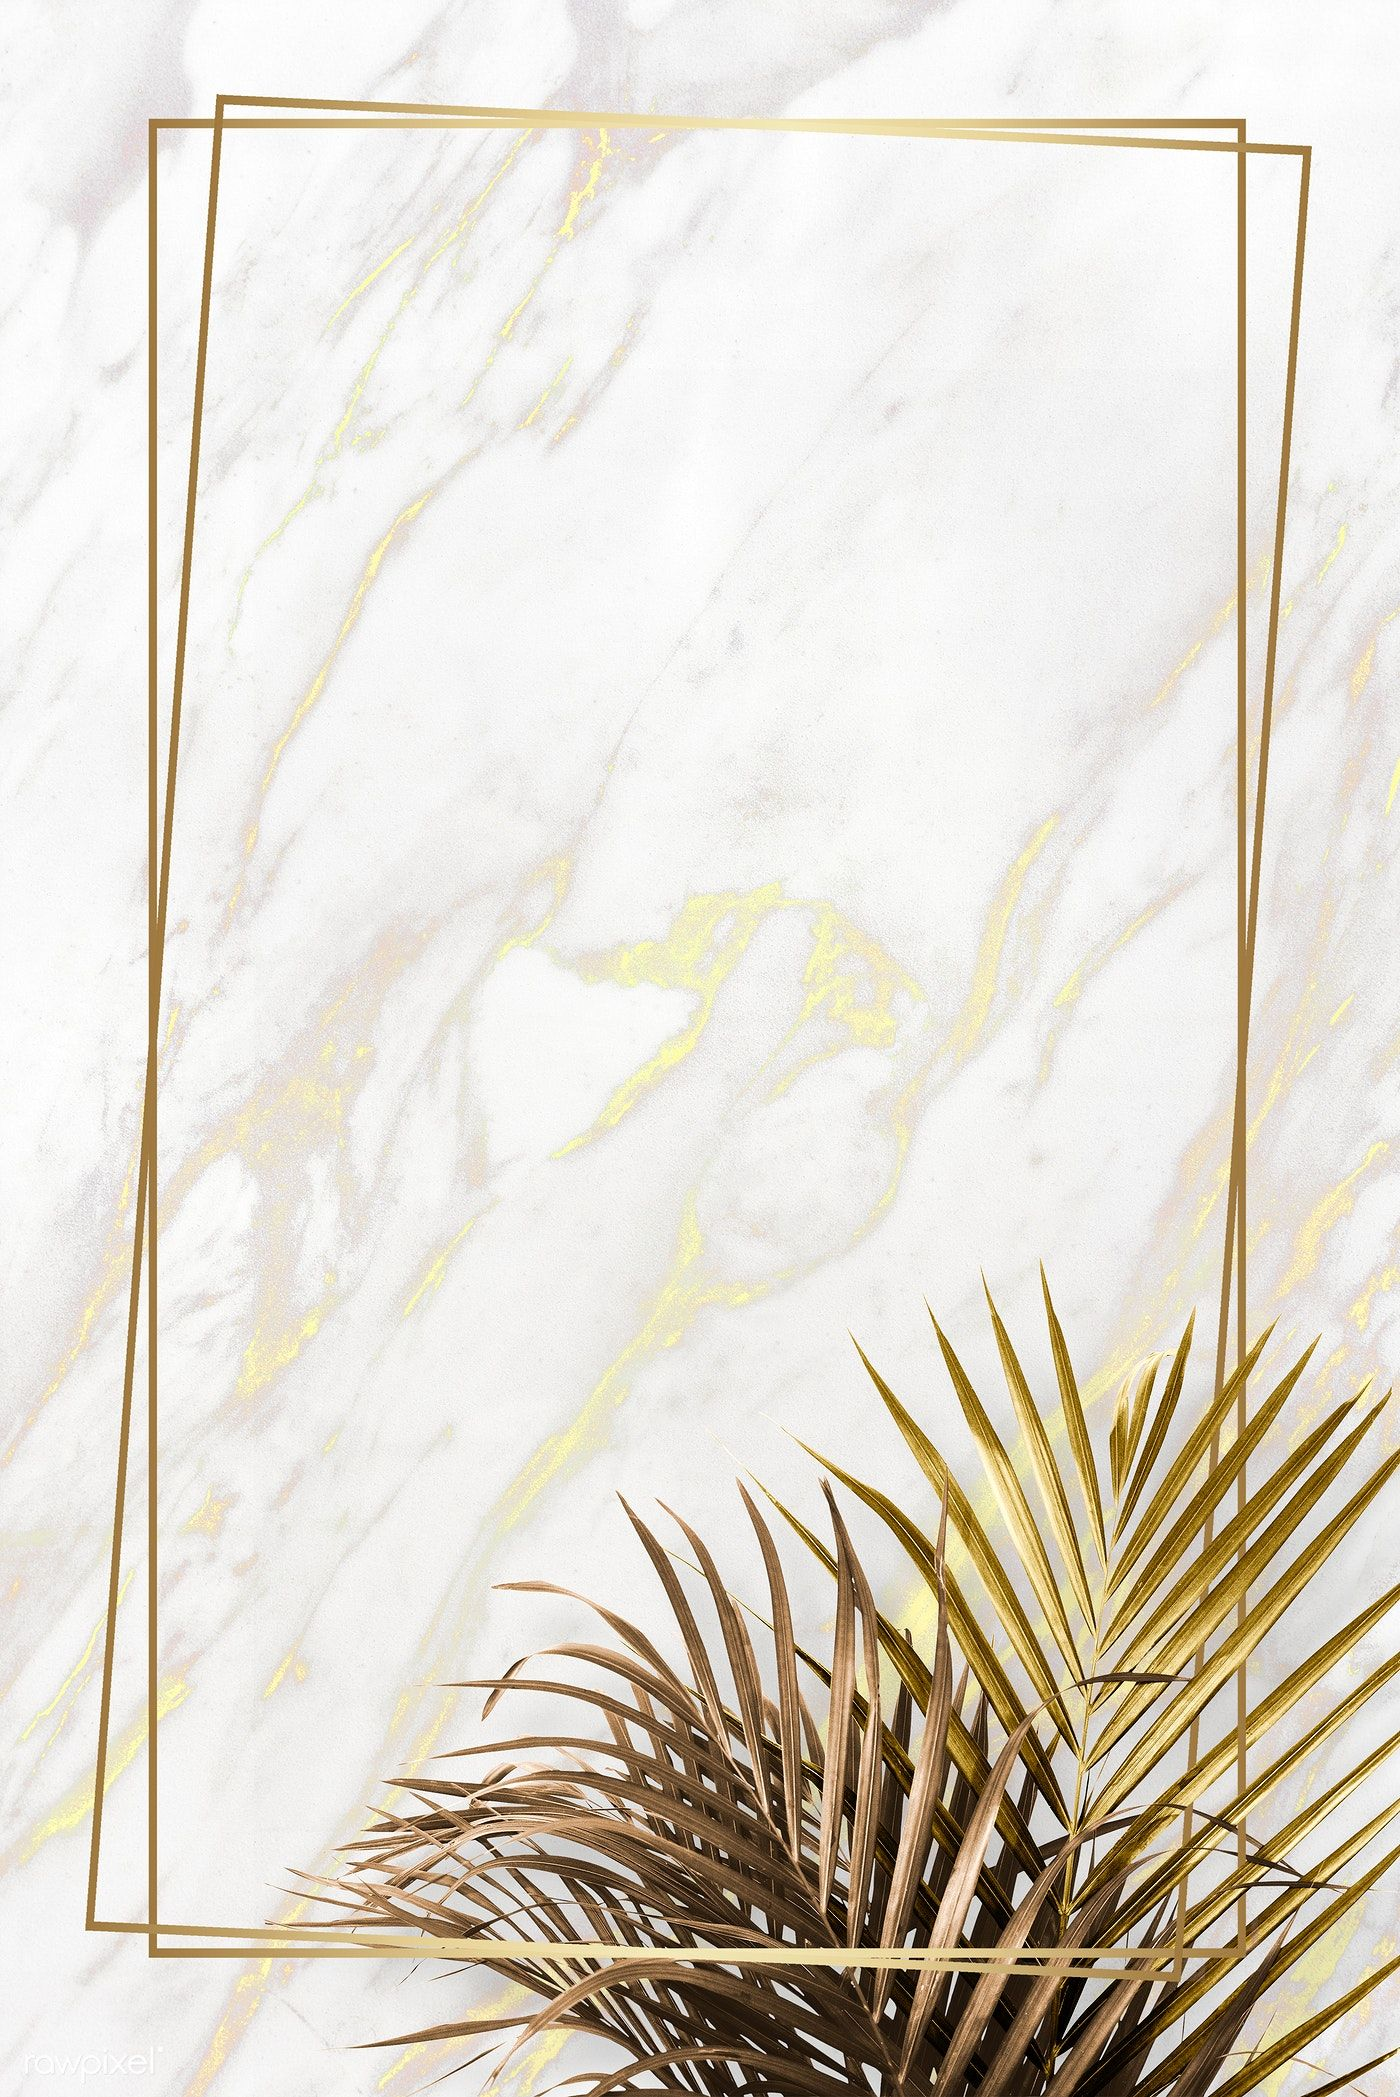 Rectangle golden frame on a marble background   premium image by rawpixel.com / Adj / HwangMangjoo / marinemynt